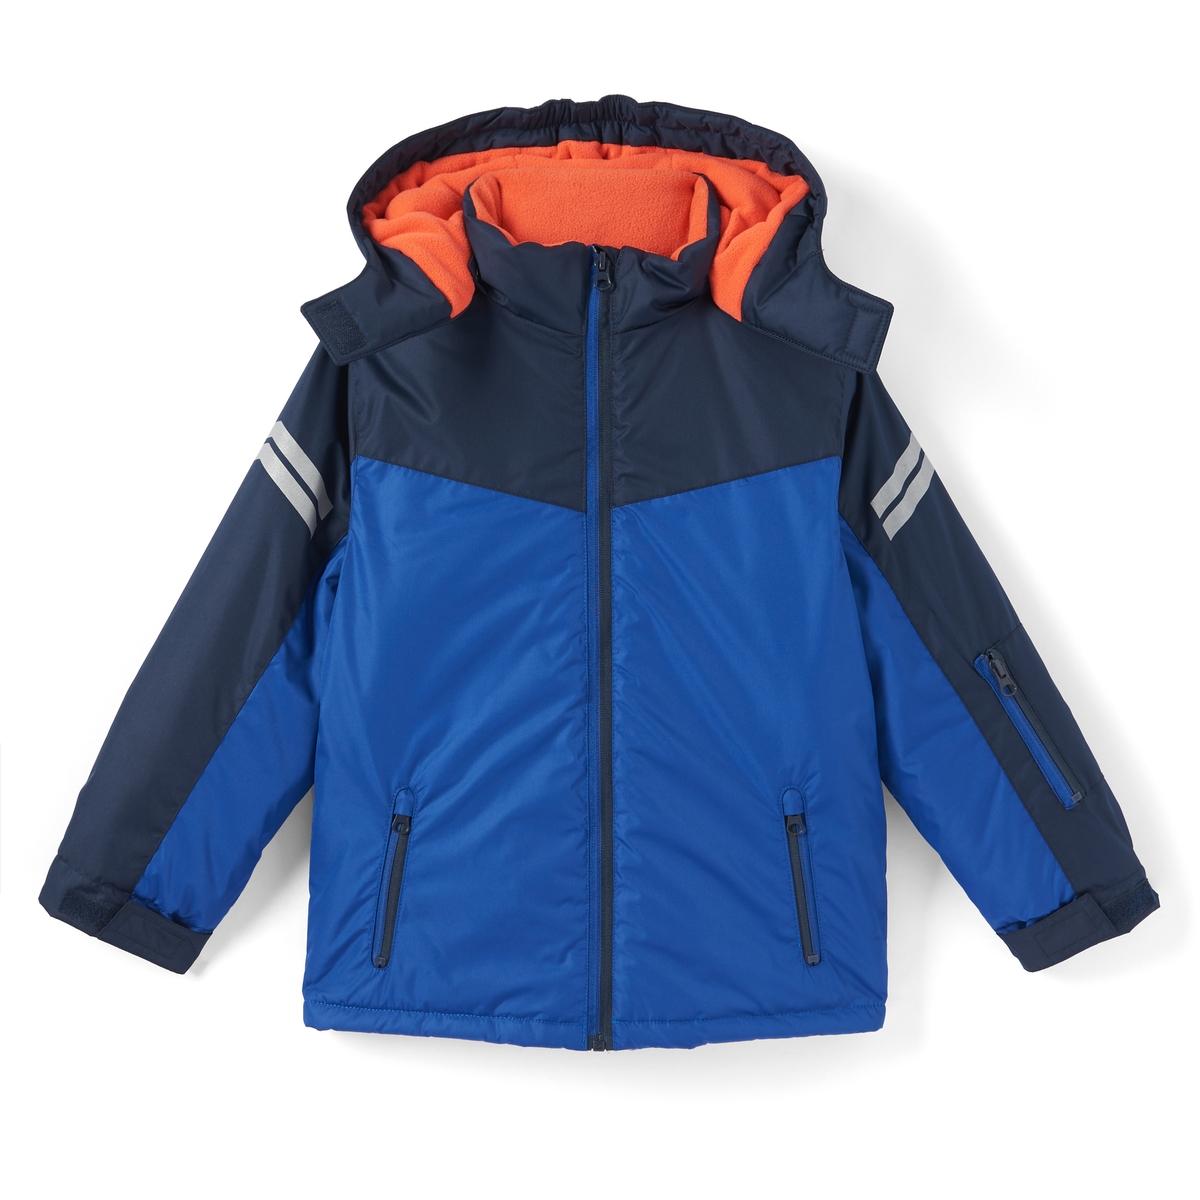 Куртка лыжная 3-16 лет куртка из твида 3 12 лет